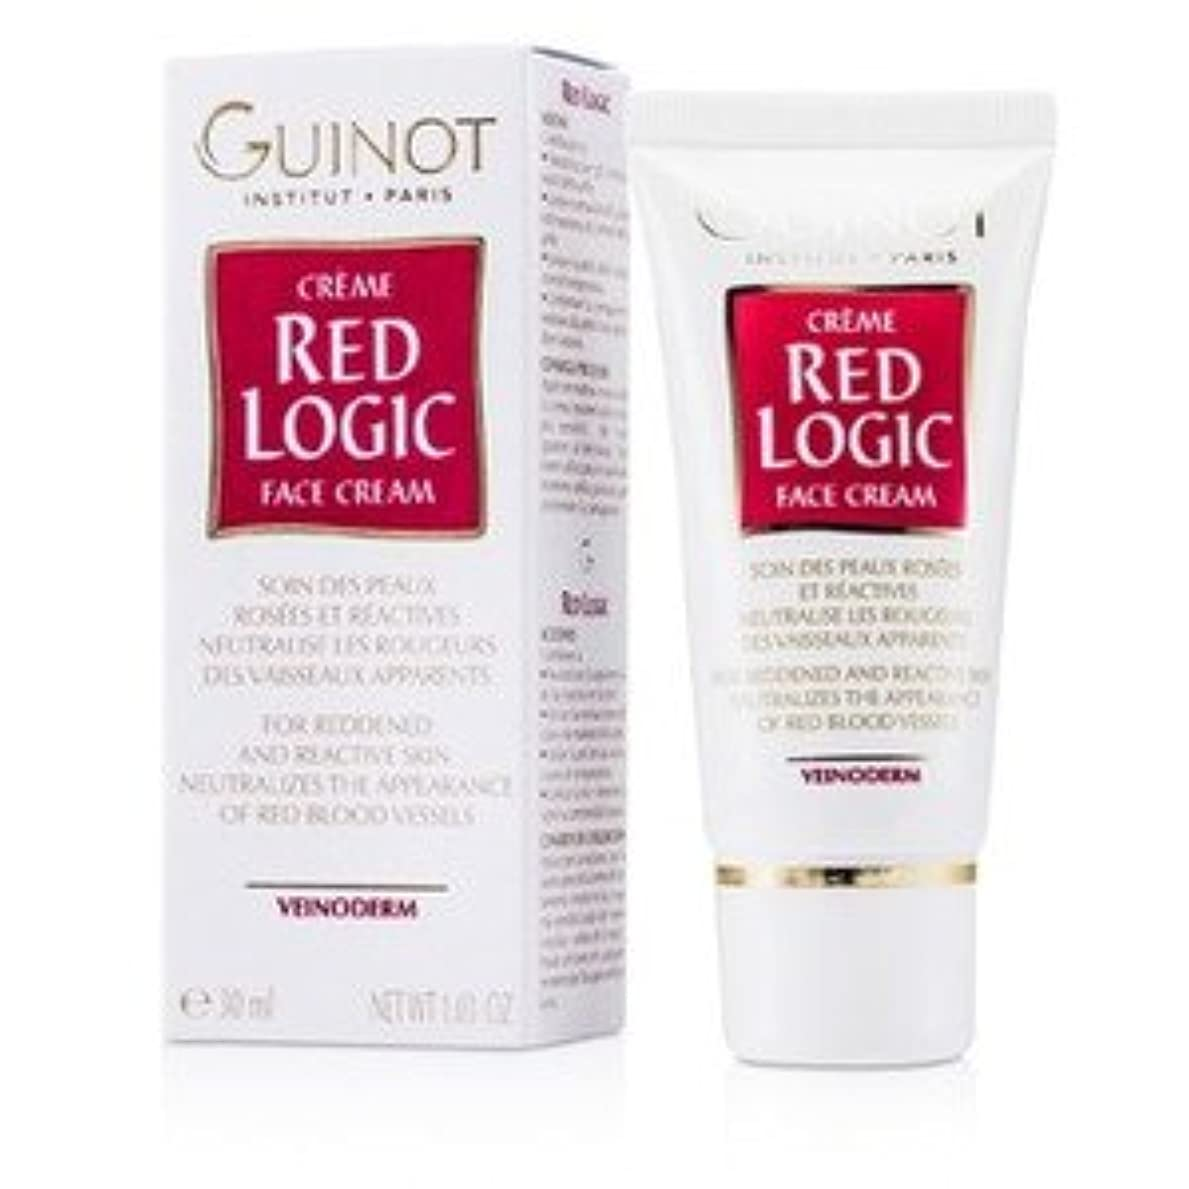 Guinot レッドロジック フェースクリーム 30ml/1.03oz [並行輸入品]